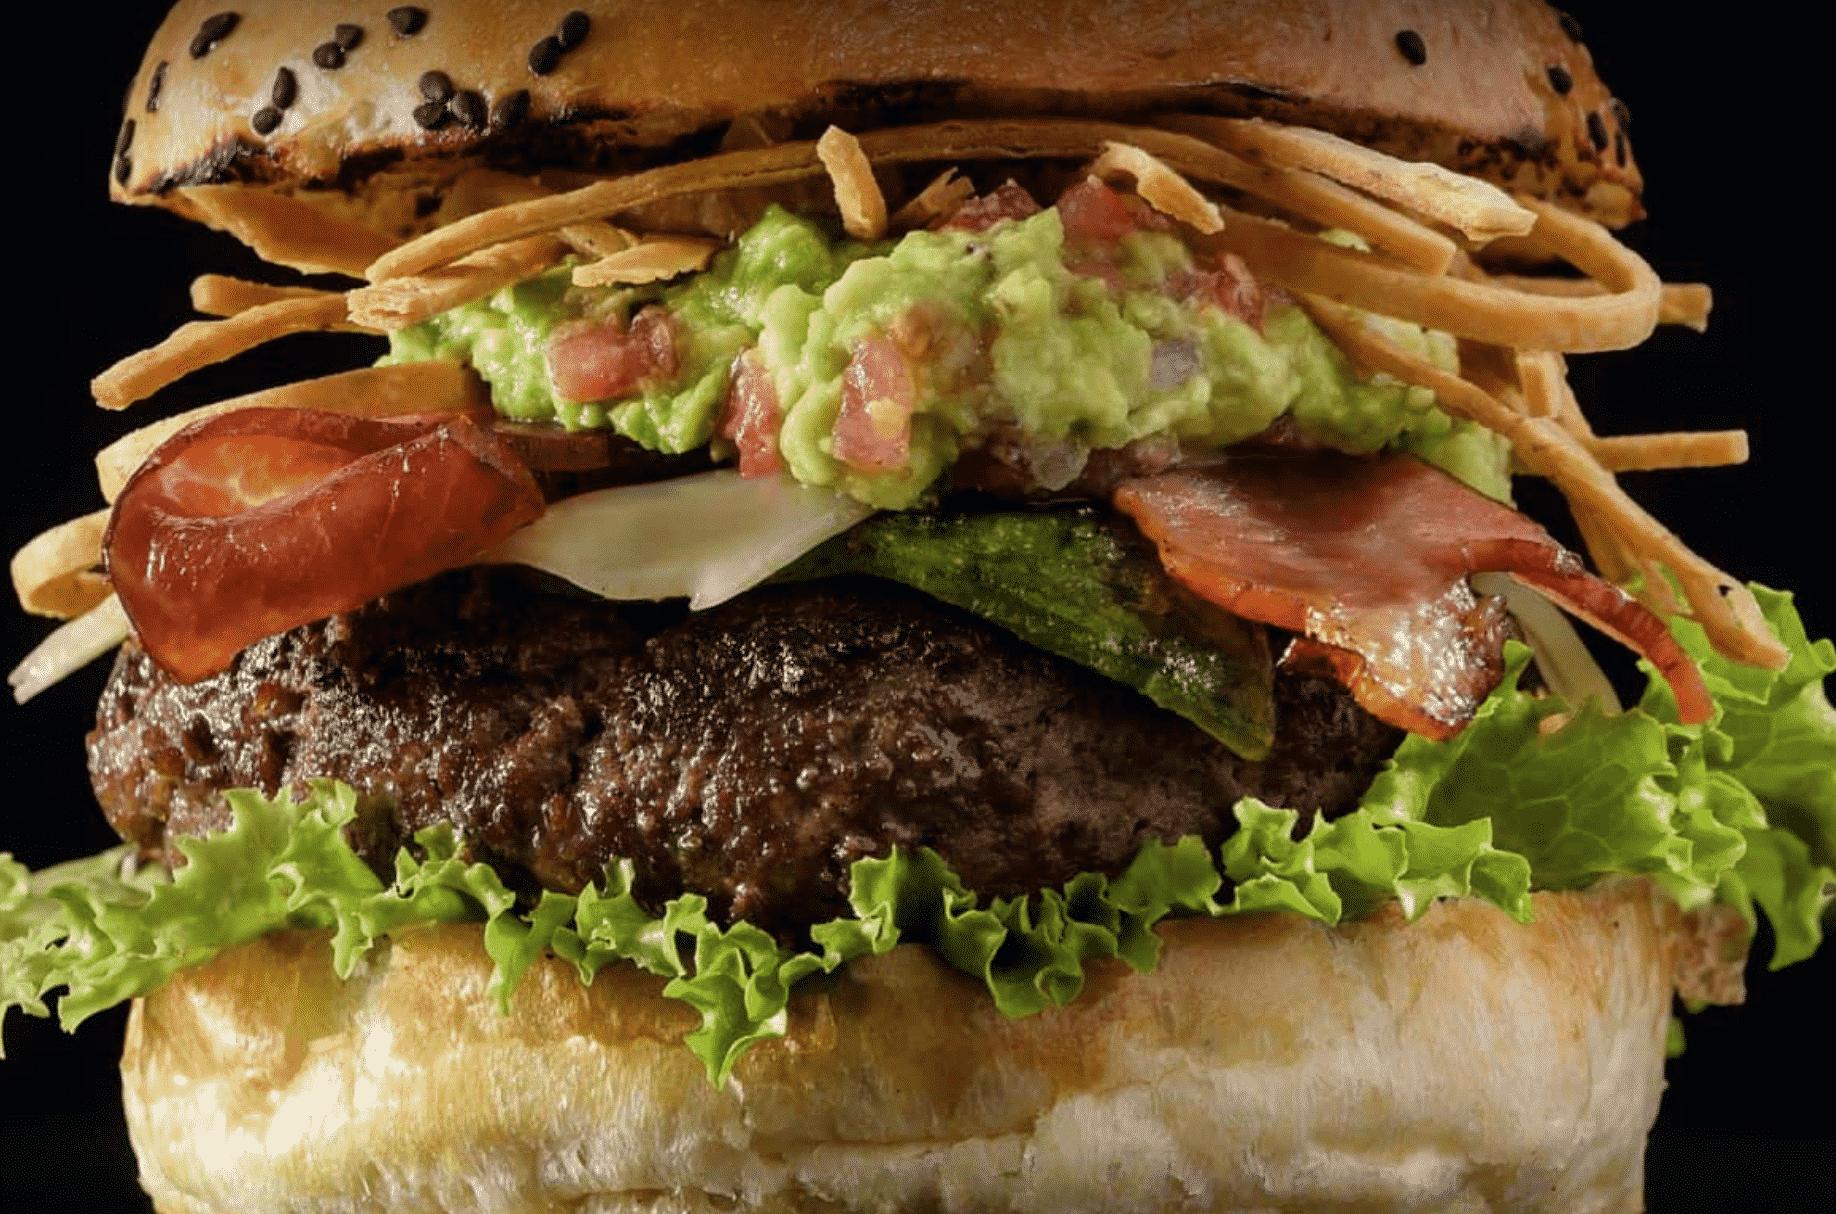 Mexico city burgers